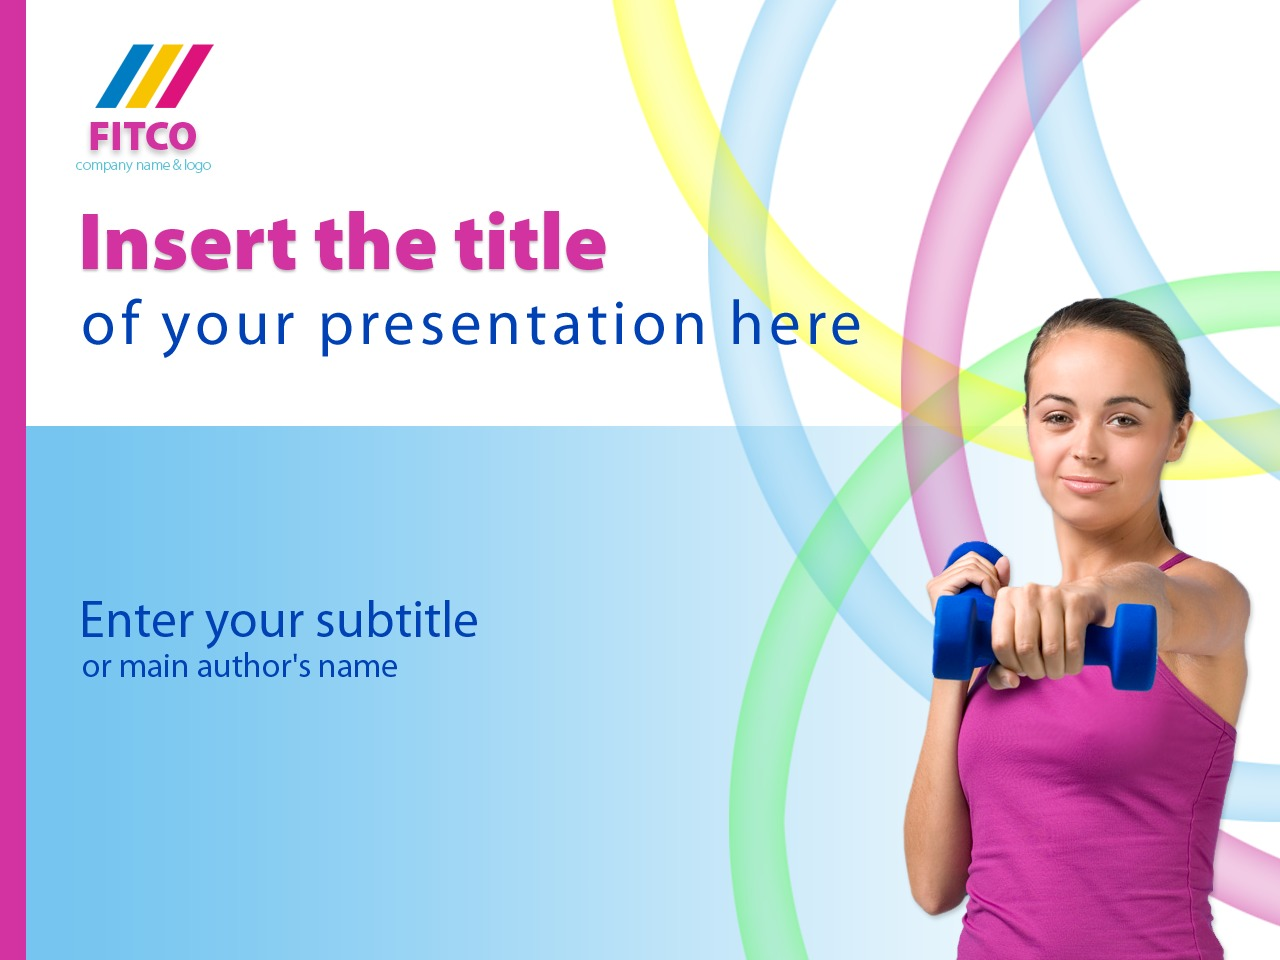 PowerPoint шаблон №25013 на тему фитнес - скриншот